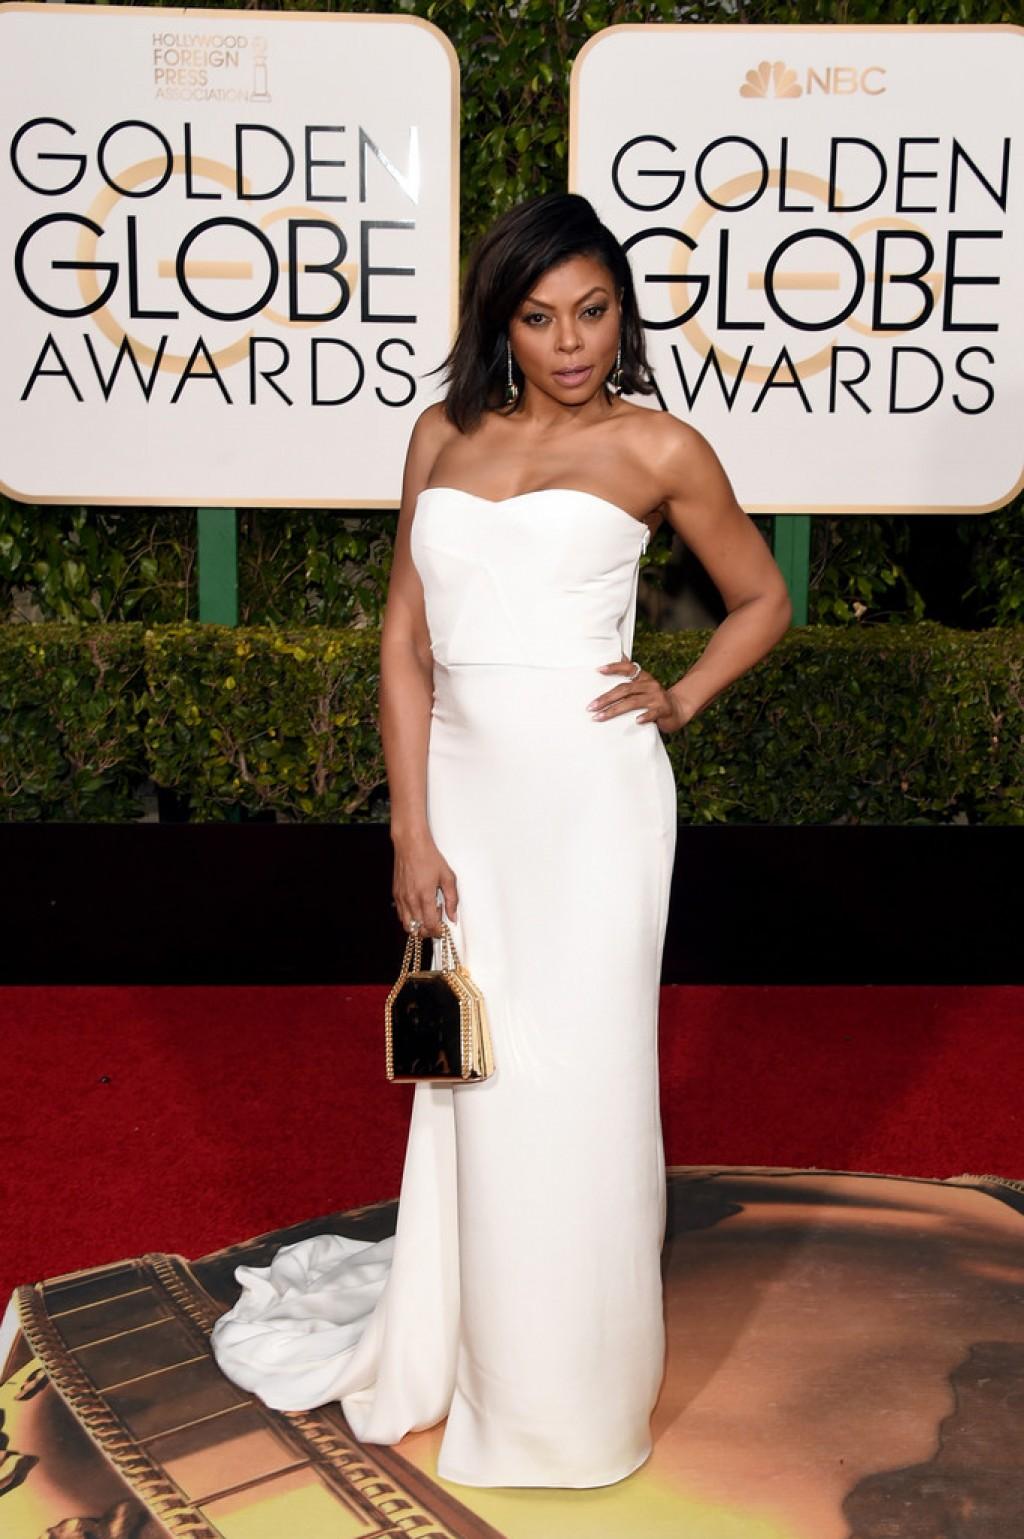 Taraji-P-Henson-Wearing-Stella-McCartney-2016-Golden-Globe-Awards-1024x1539